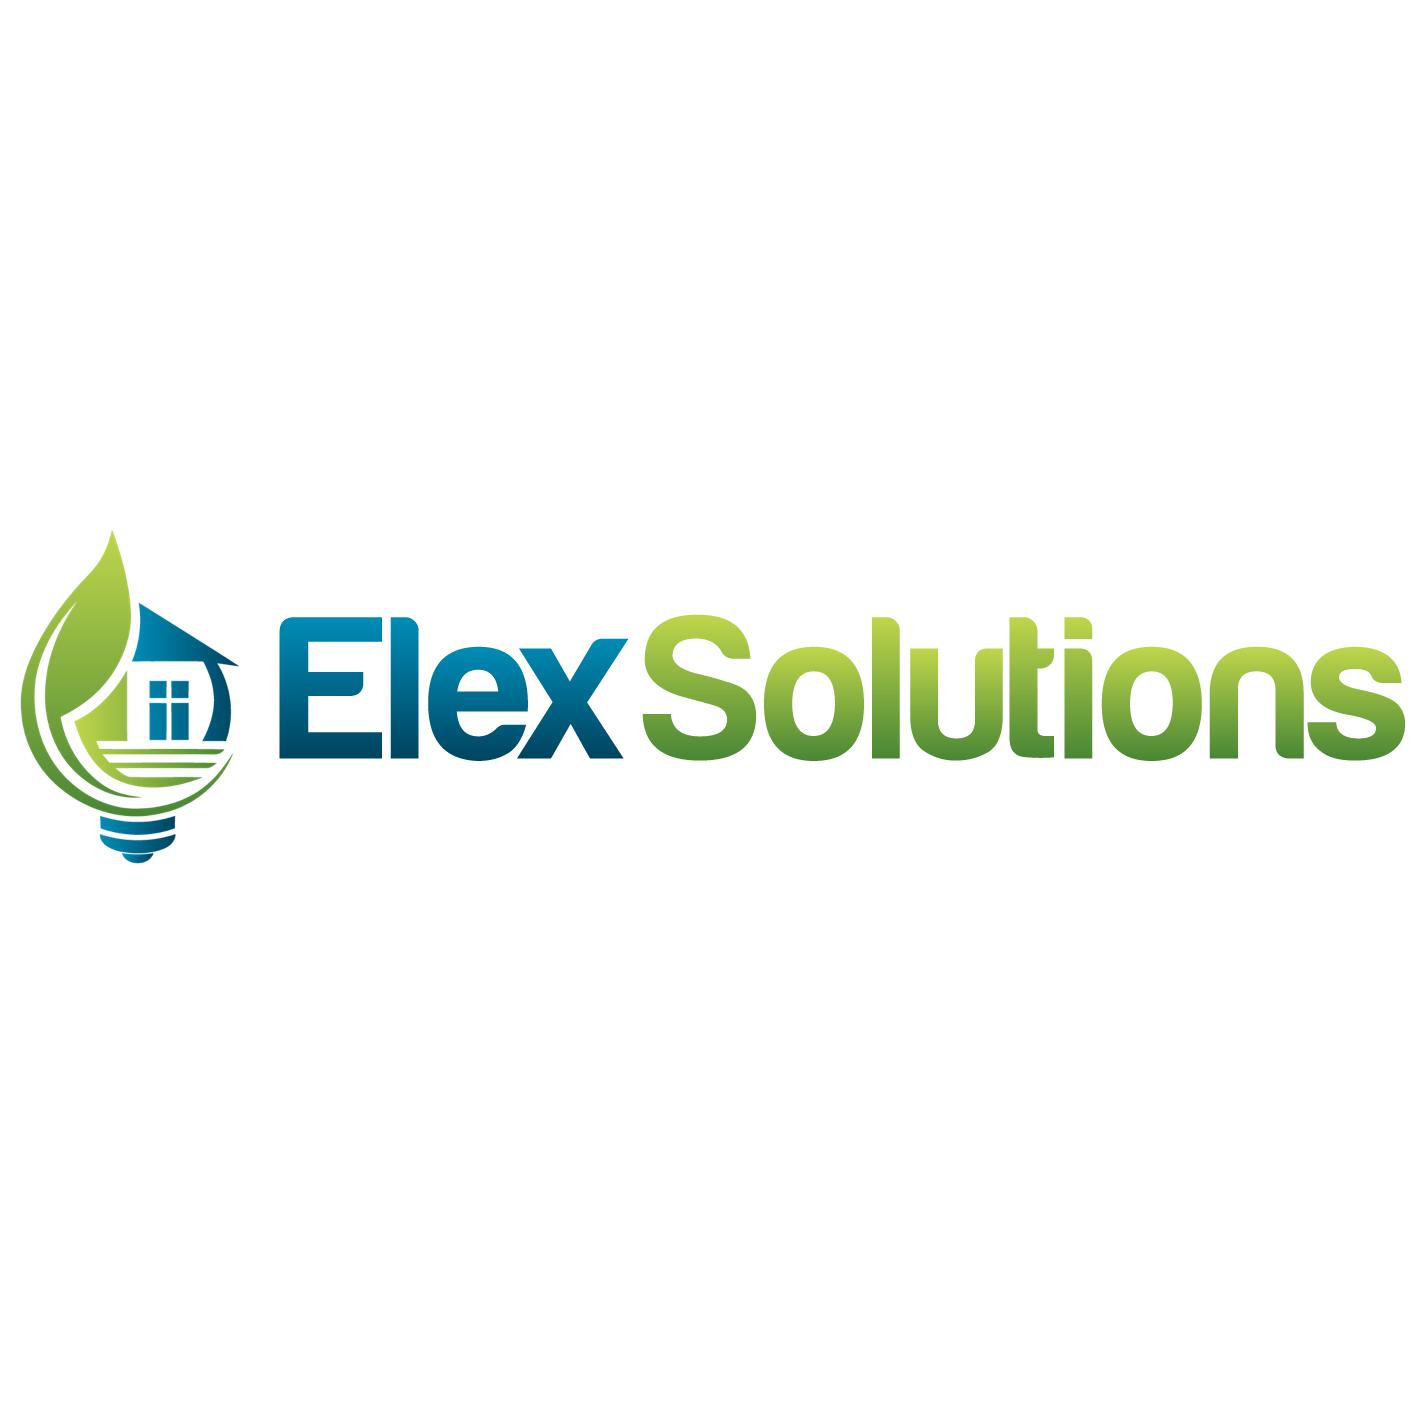 Elex Solutions